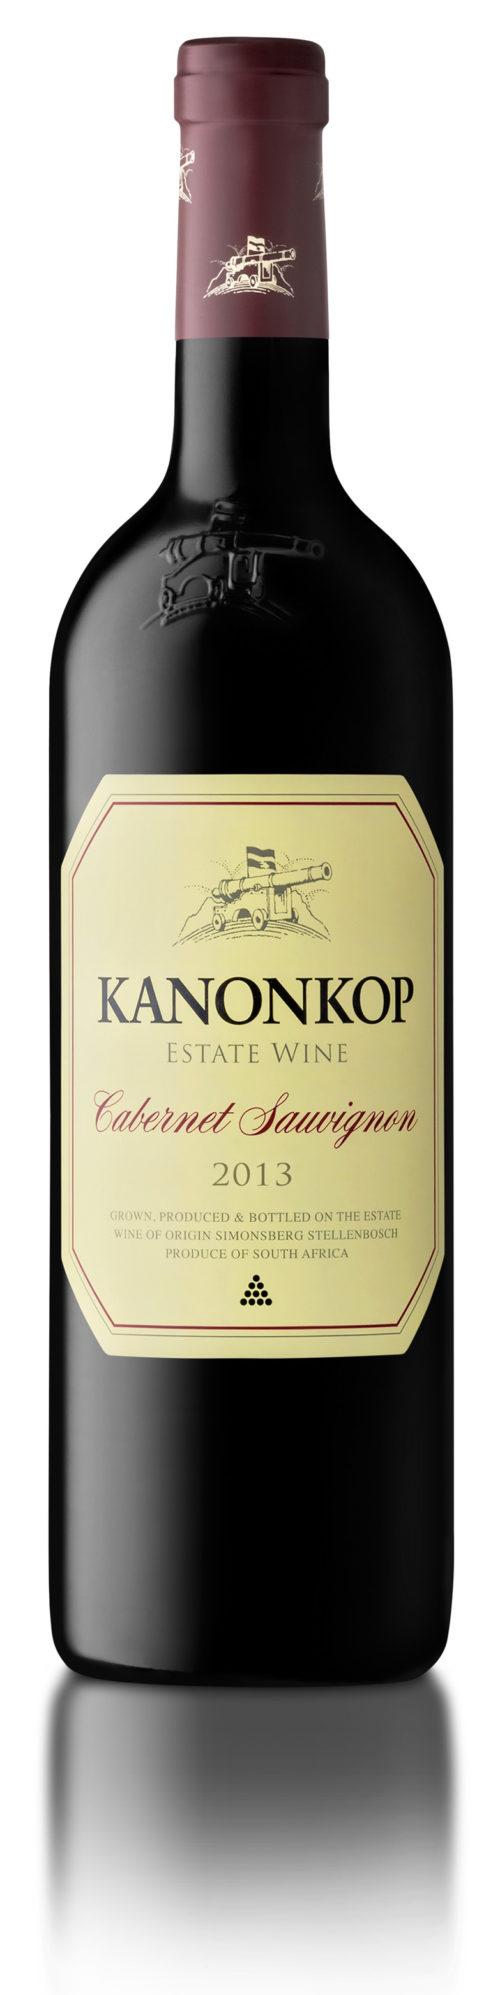 CABERNET SAUVIGNON 2013 KANONKOP 0,75